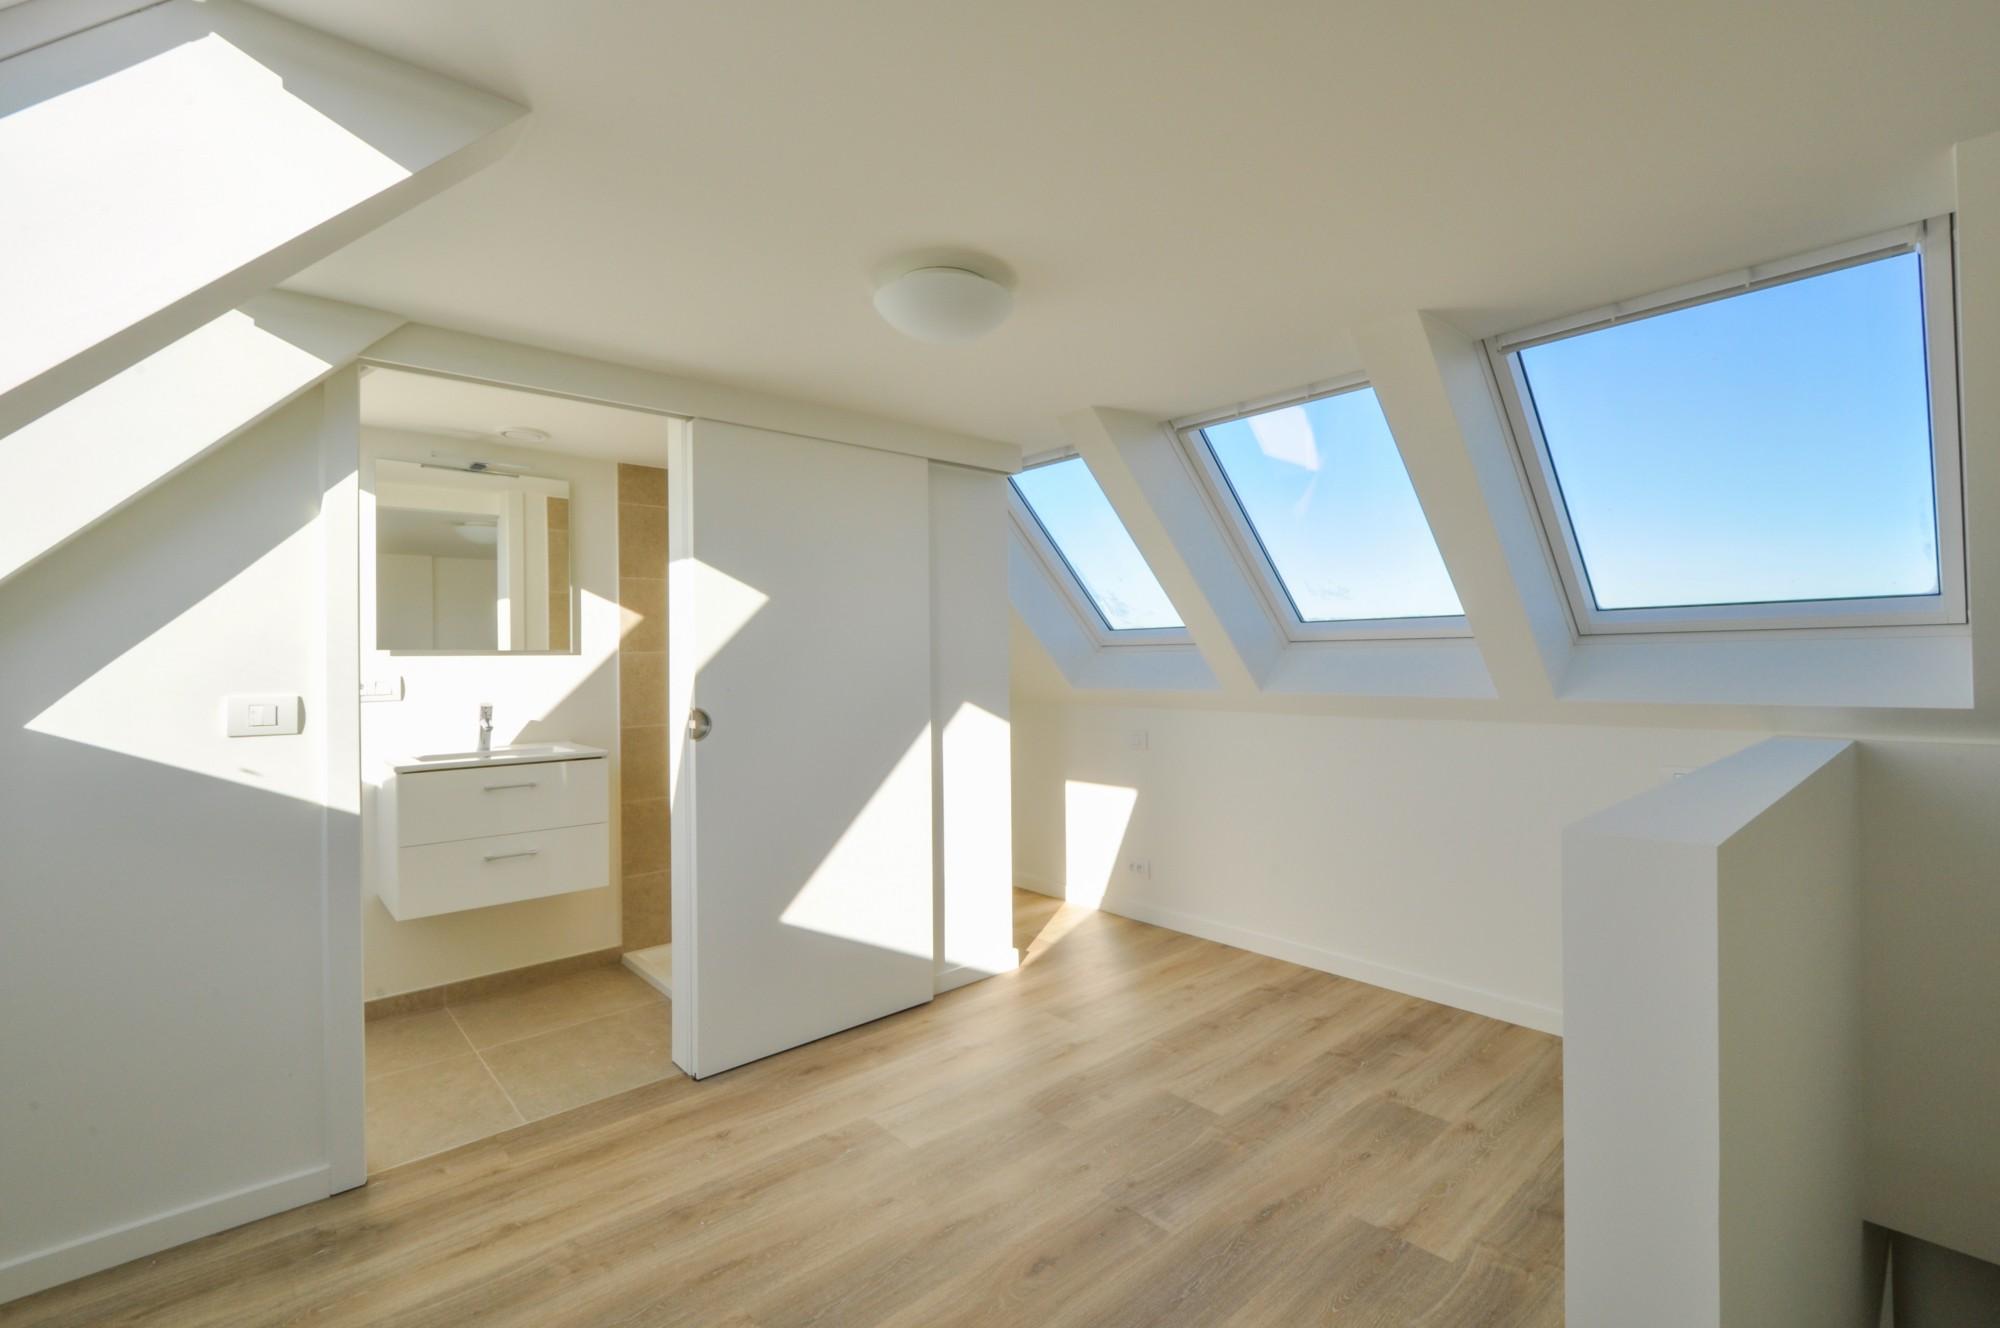 Location Maison 3 CH Knokke-Heist - Nouvelle construction Graaf Jansdijk / Vue Polders